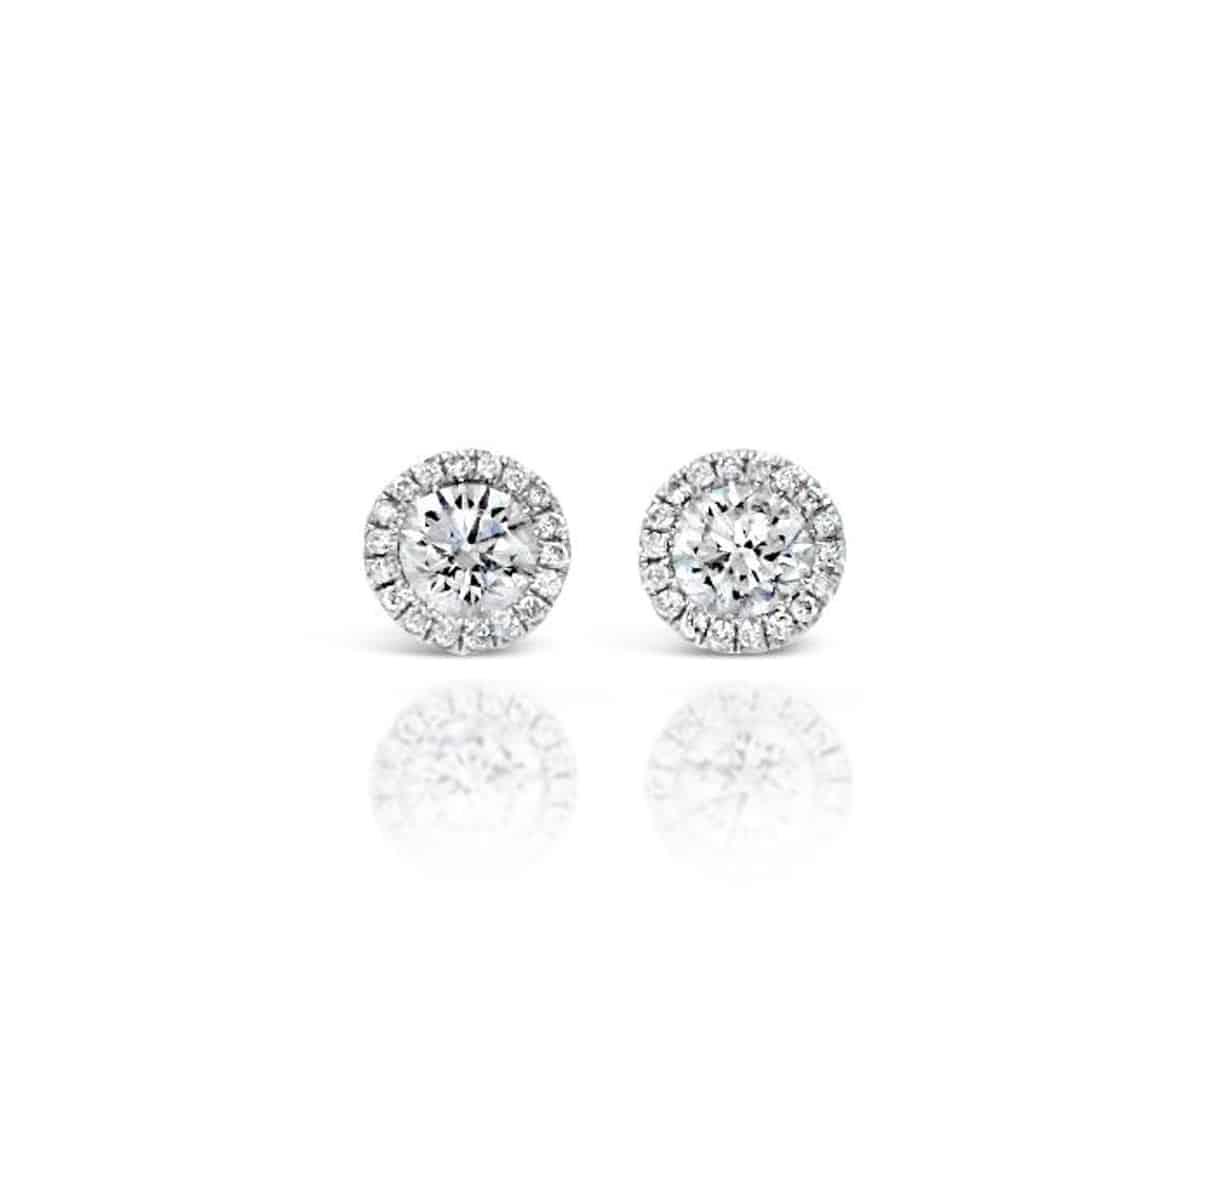 White Gold Diamond Stud Earrings with Diamond Halos